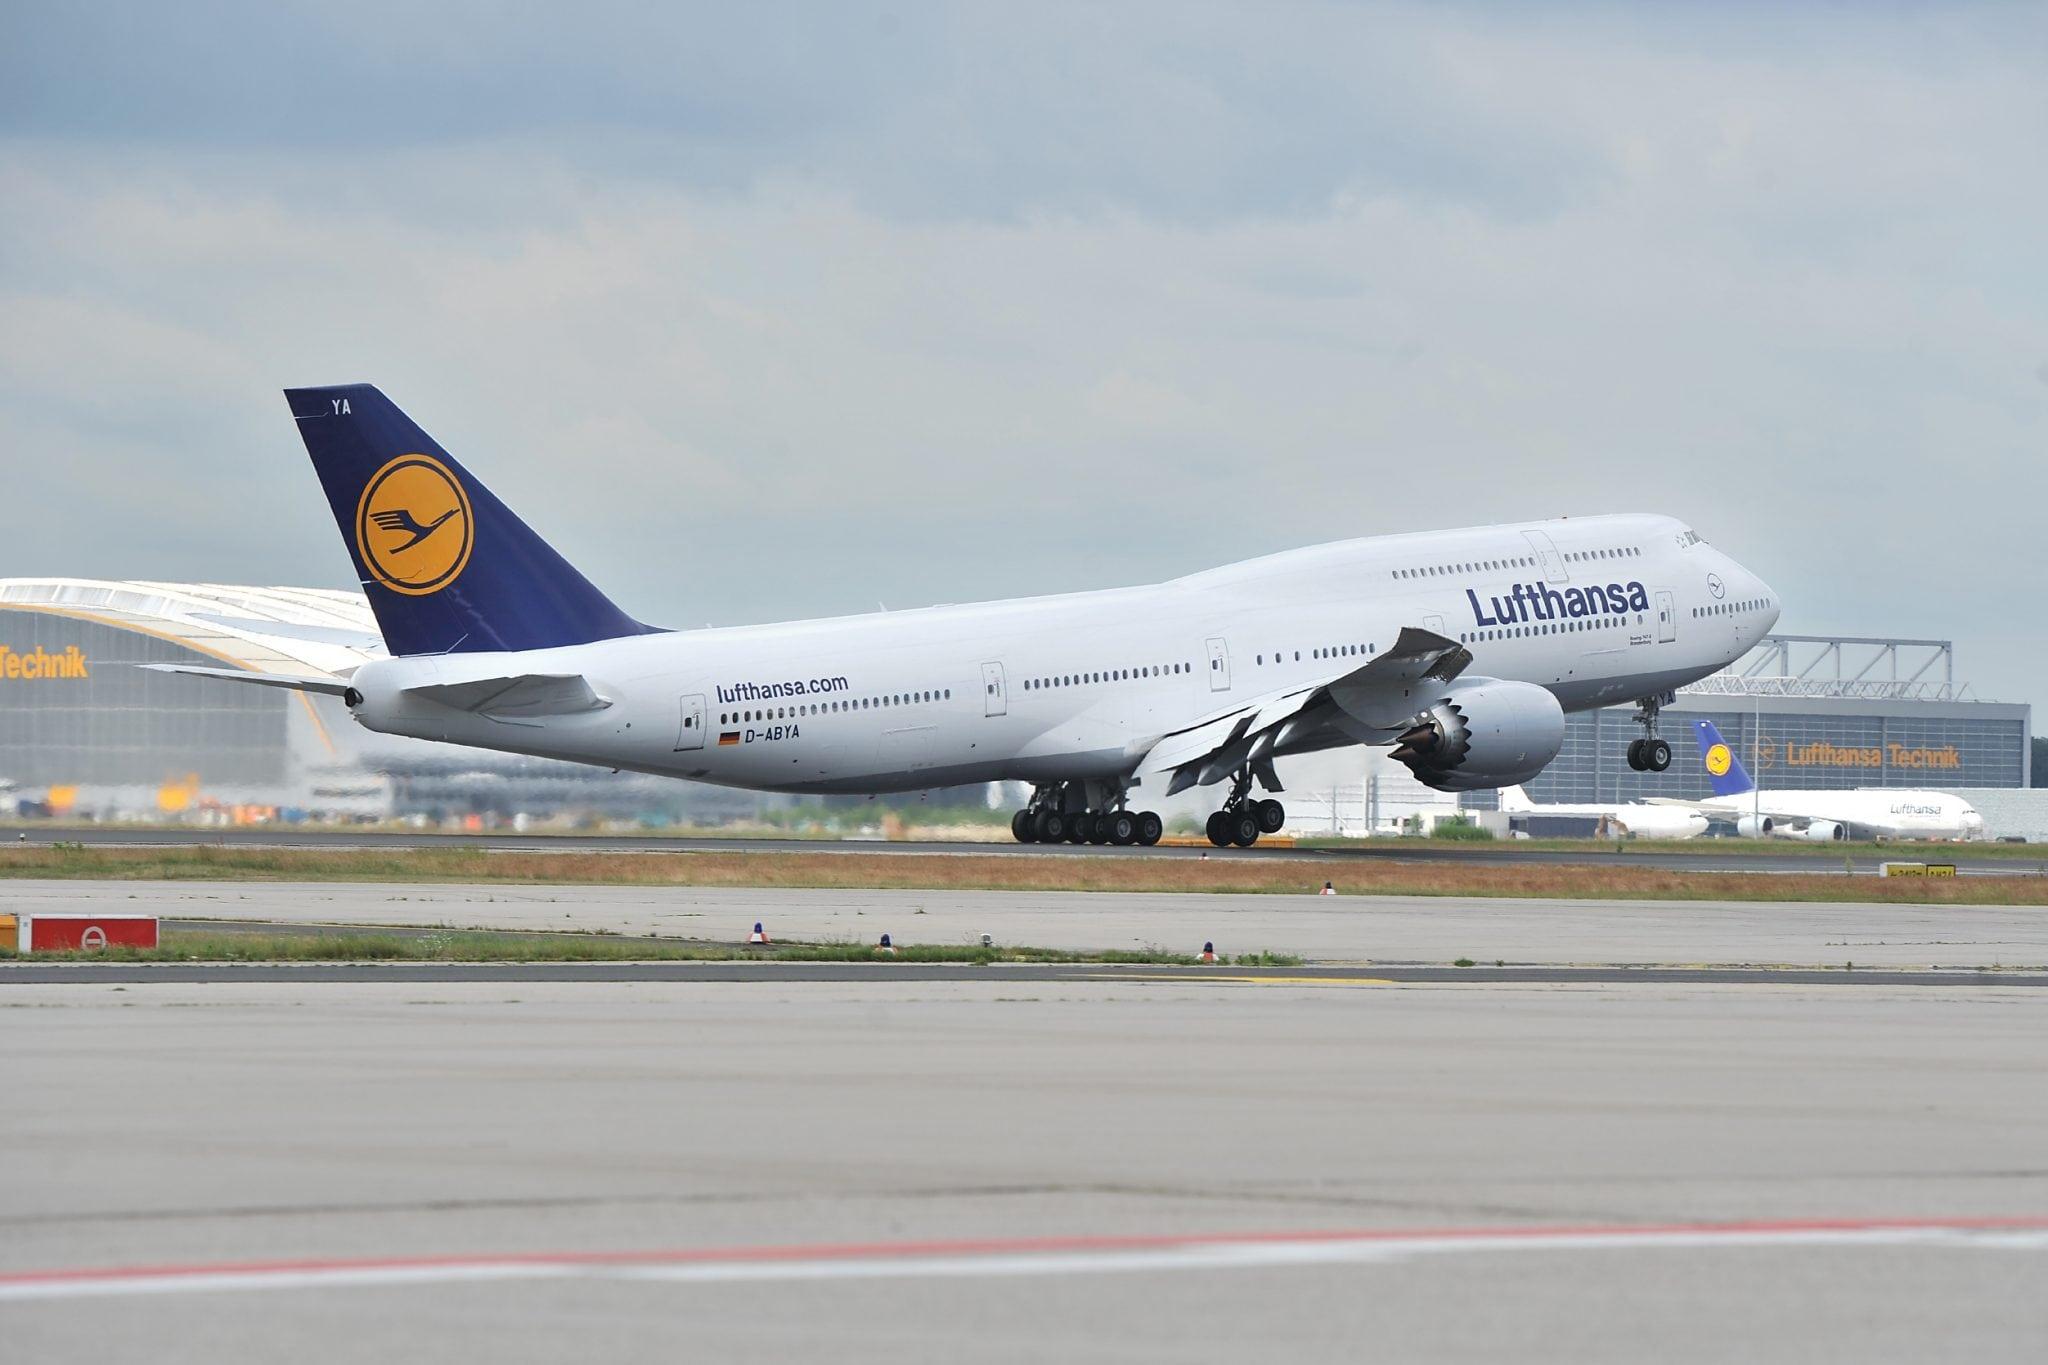 LufthansaFrankfurt-2